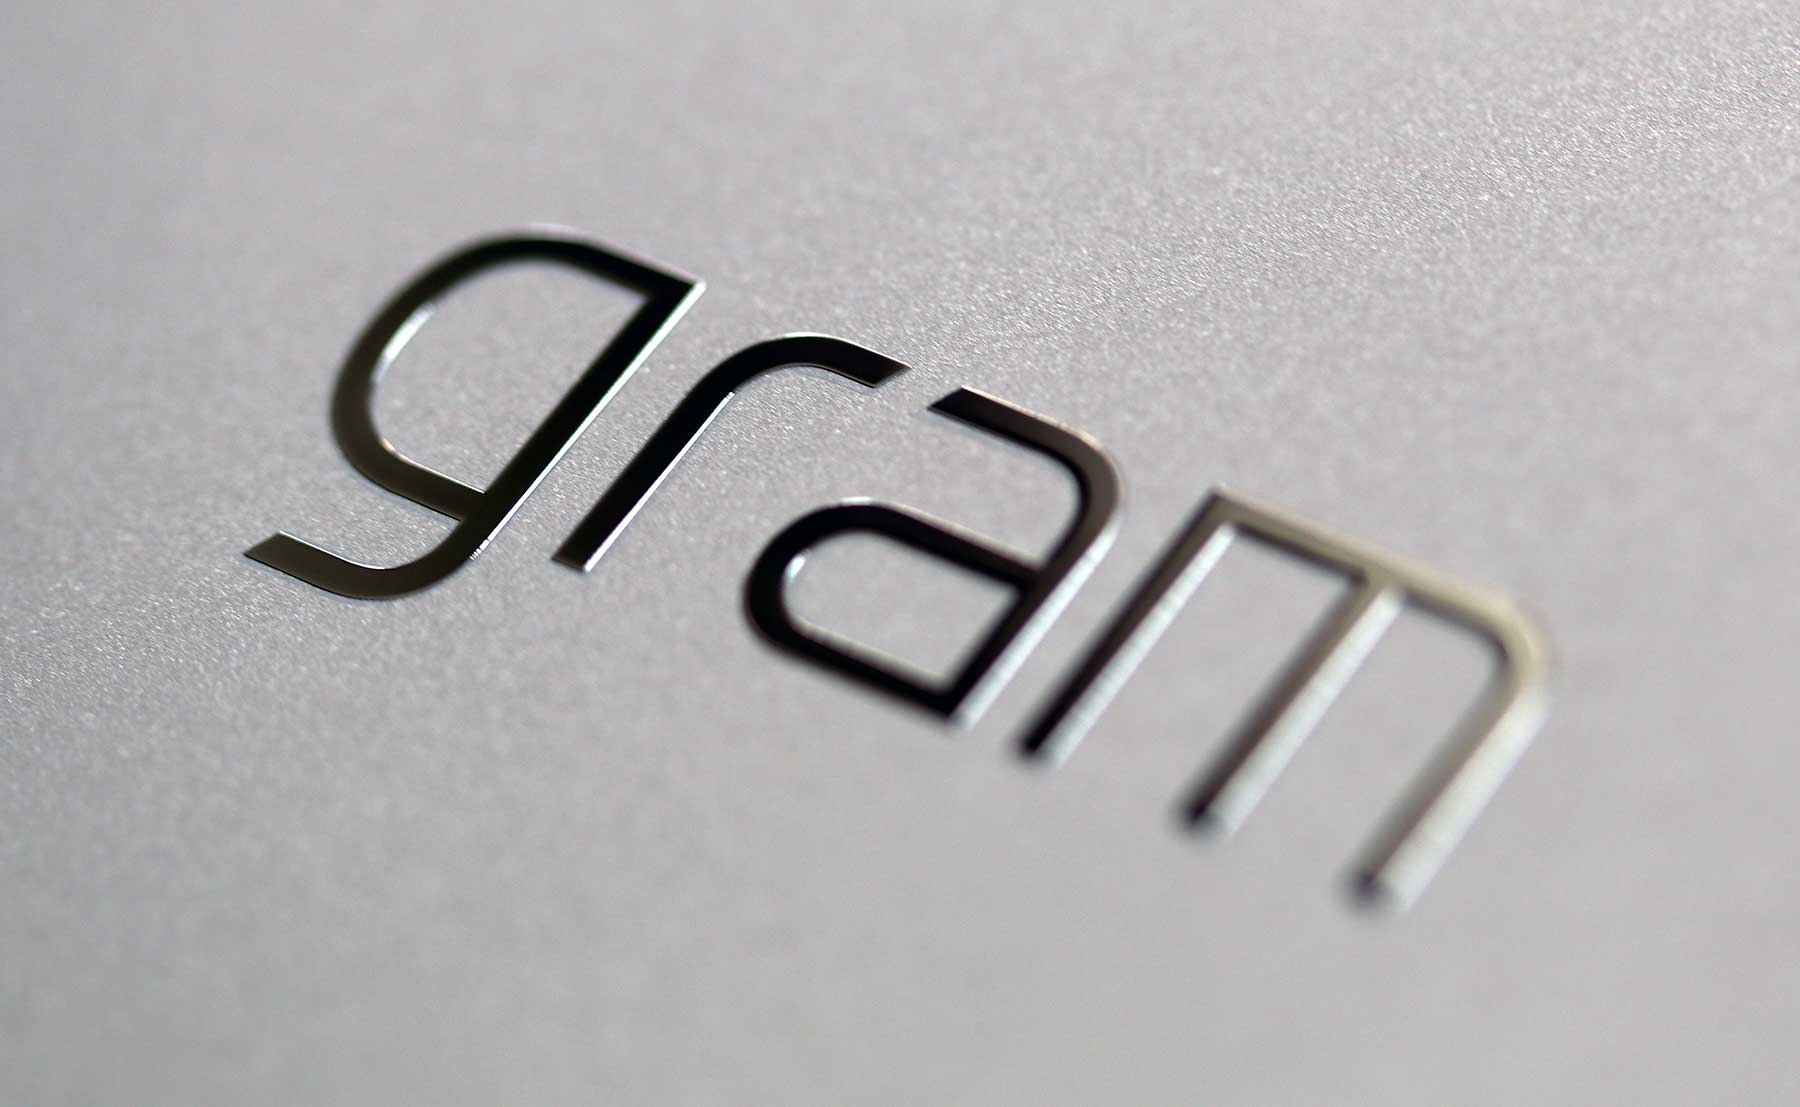 Laptop-Testbericht: Neues LG gram 17-Zoll-Notebook (2021er Version) LG-gram-17_2021_Testbericht_05